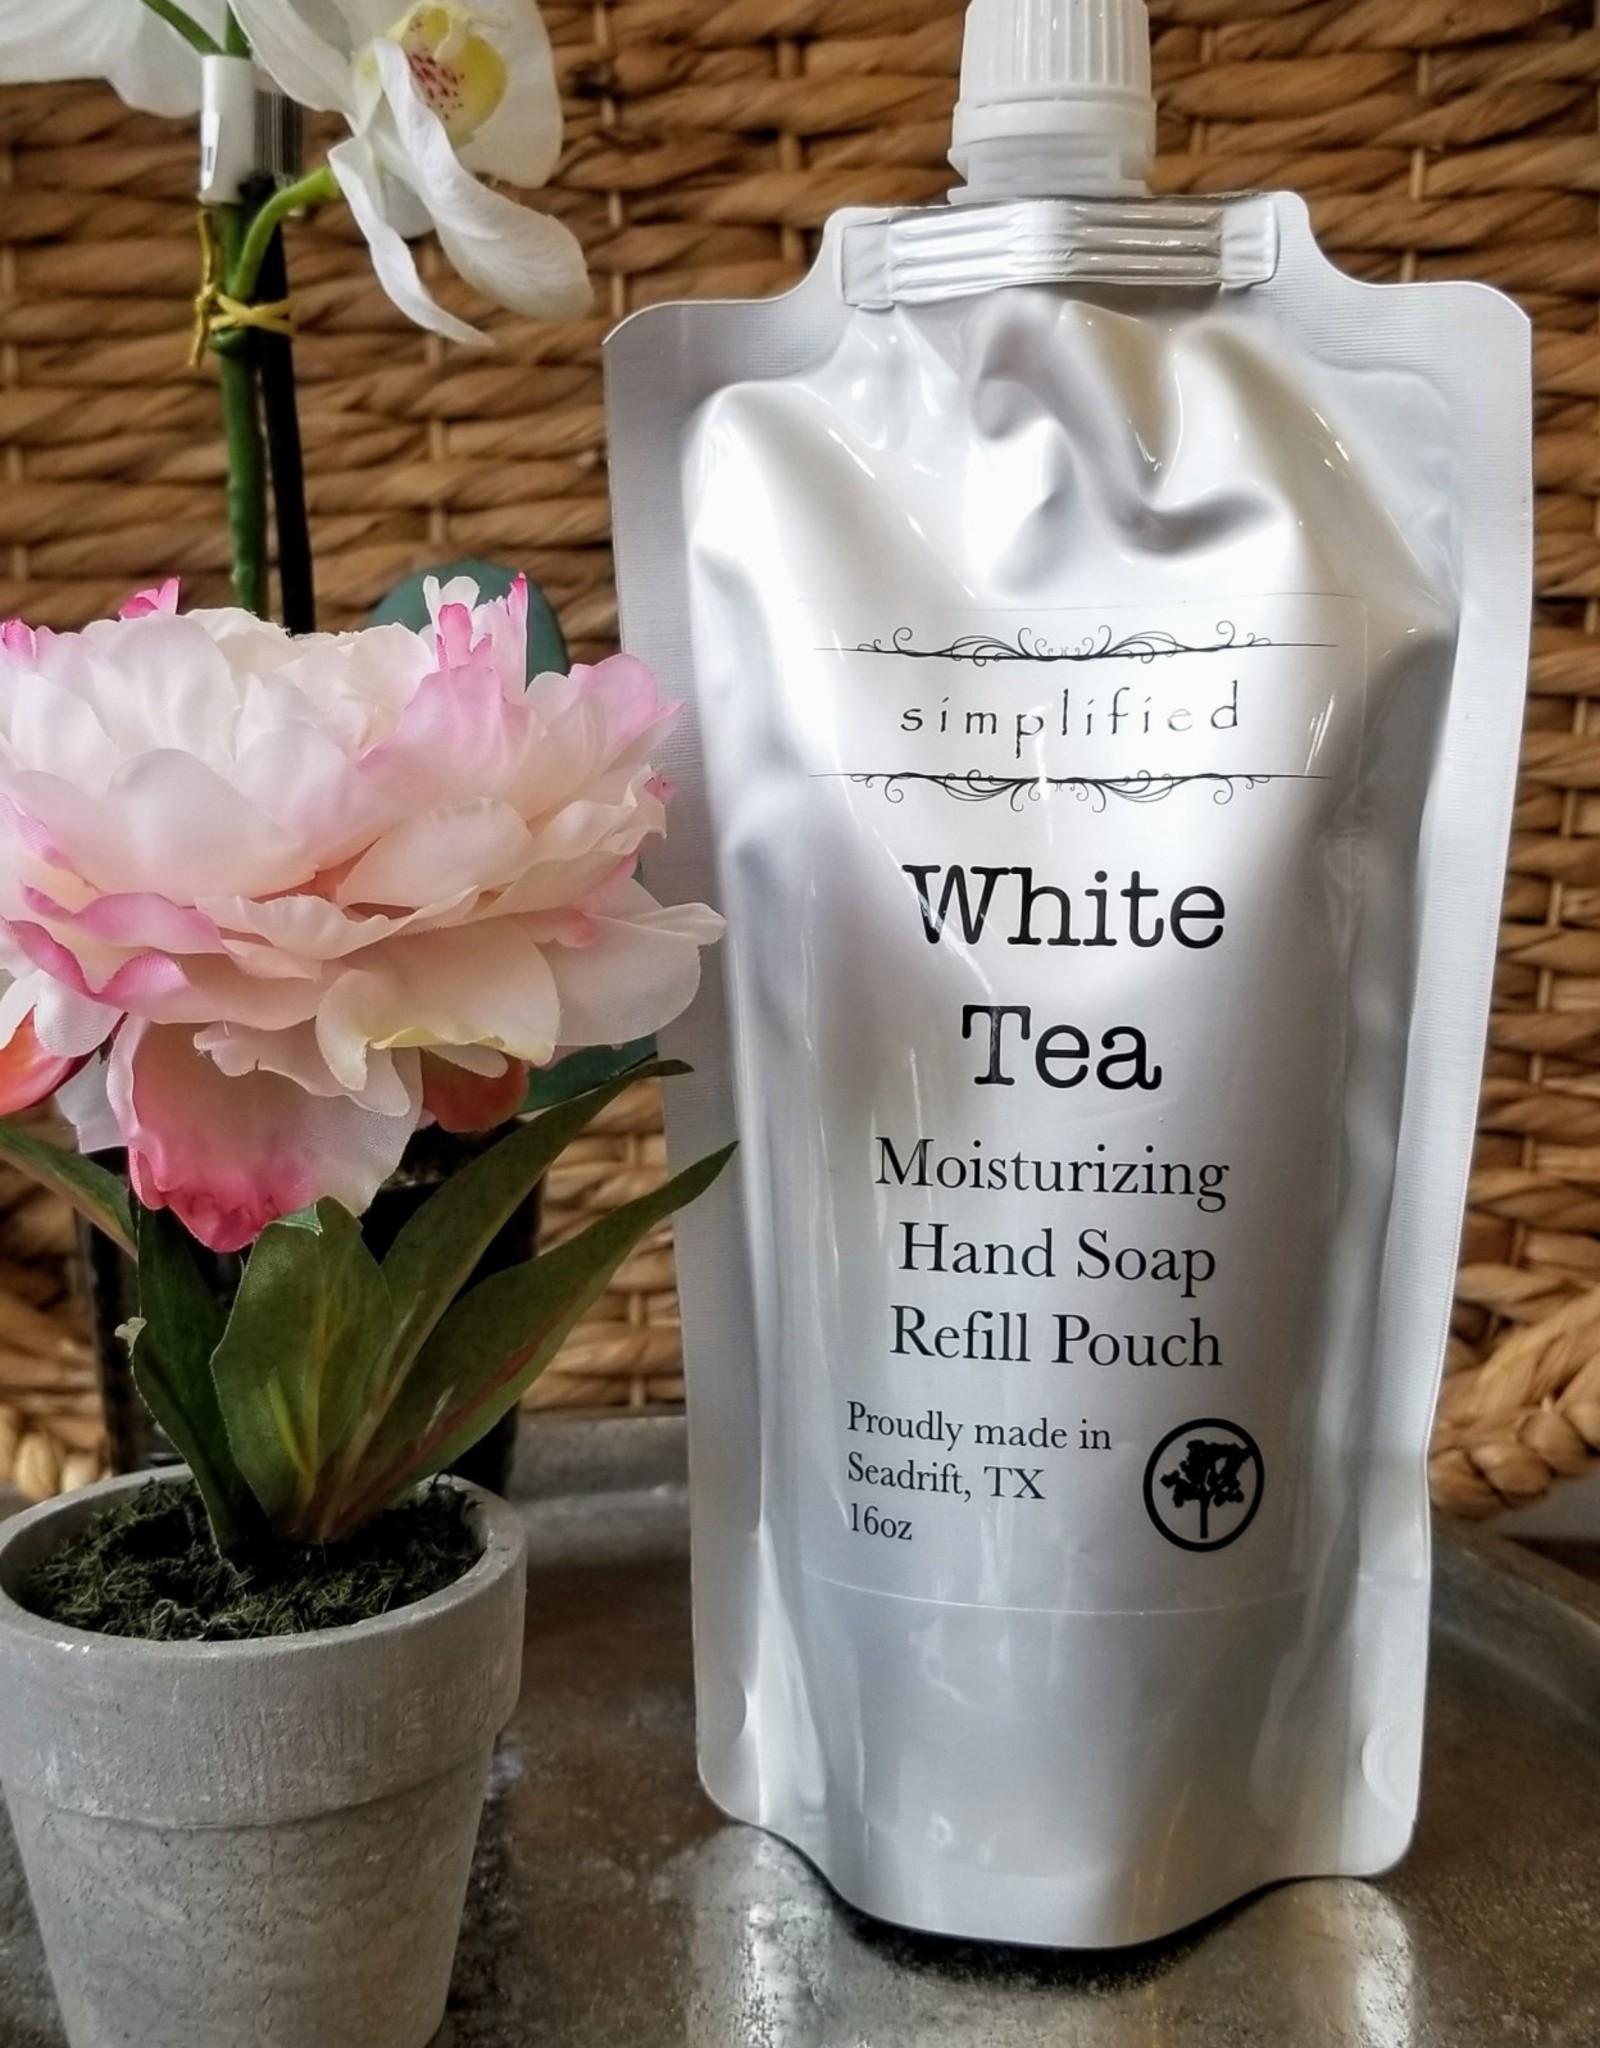 Simplified Soap Hand Soap Refill - White Tea